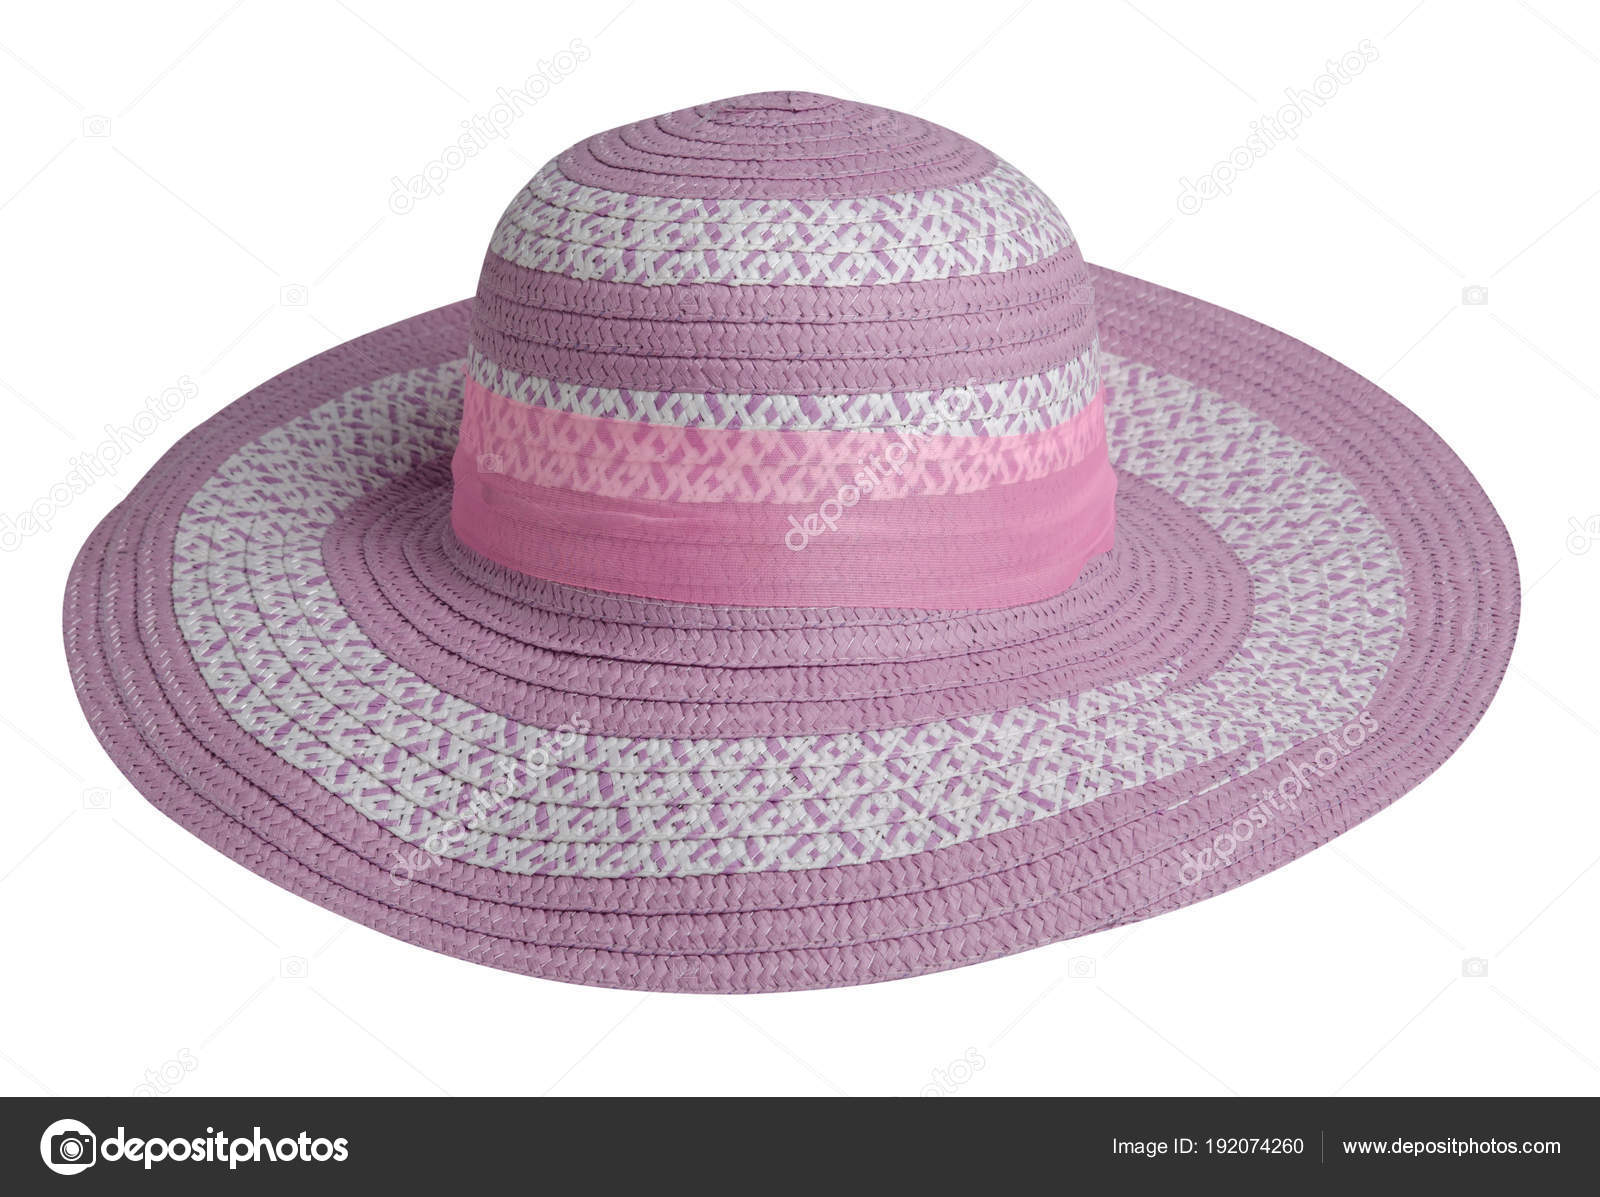 930274befe Γυναικείο καπέλο. πλεκτό καπέλο που απομονώνονται σε λευκό φόντο — Εικόνα  από Vitalily73